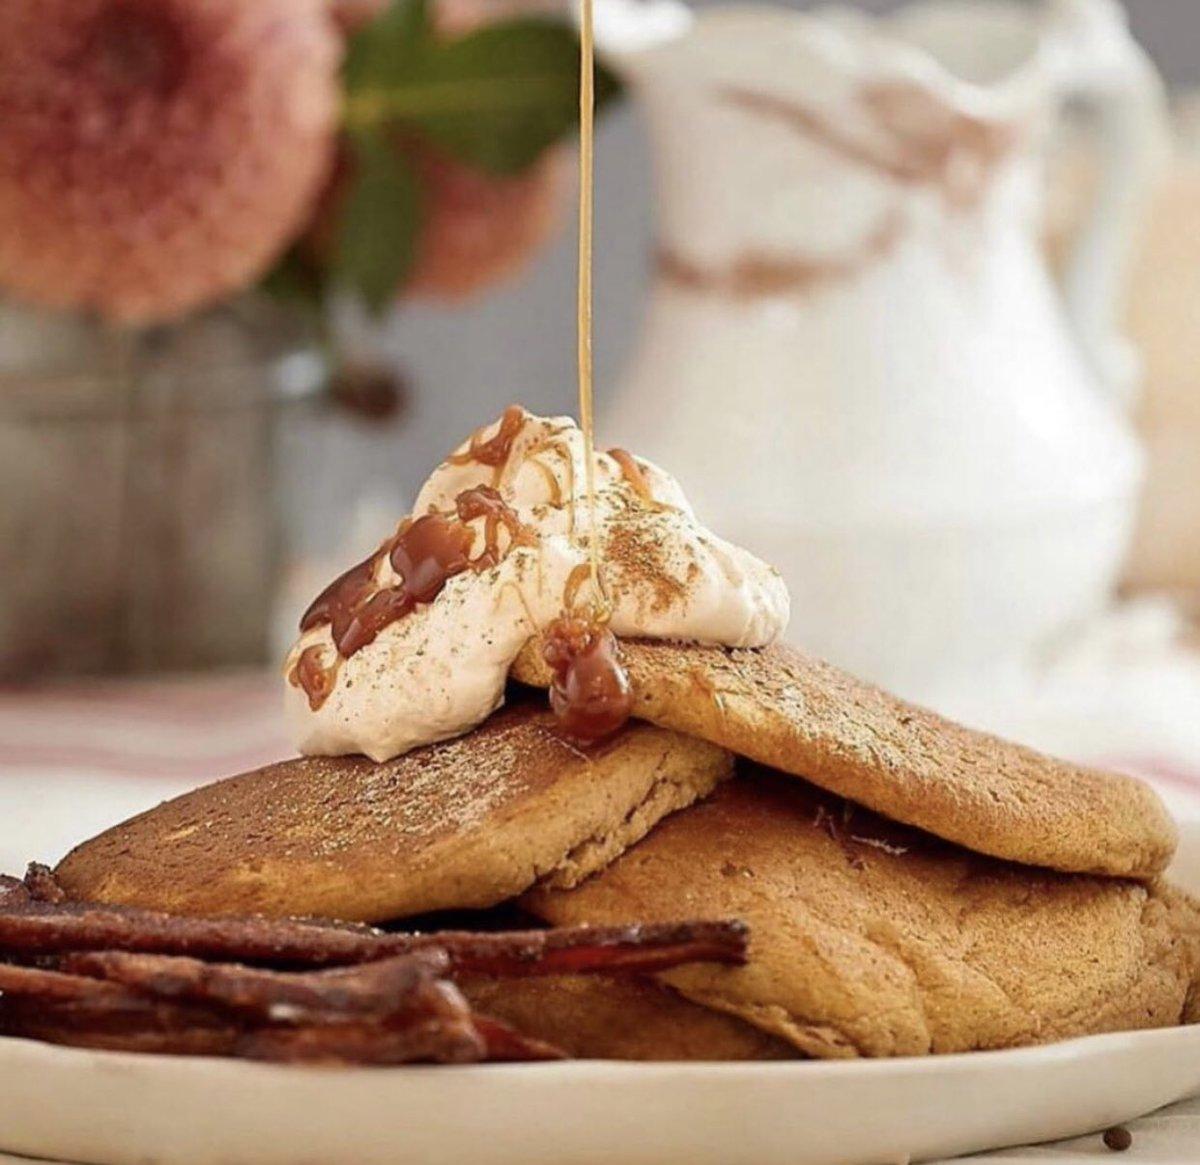 Who's ready for brunch? You'll love these pumpkin chai gluten free pancakes. https://t.co/tgX3sD3hCC     #glutenfreerecipe #RyzeGlutenFree #glutenfreebaking #glutenfreepancakes https://t.co/JwYoWpM4sr